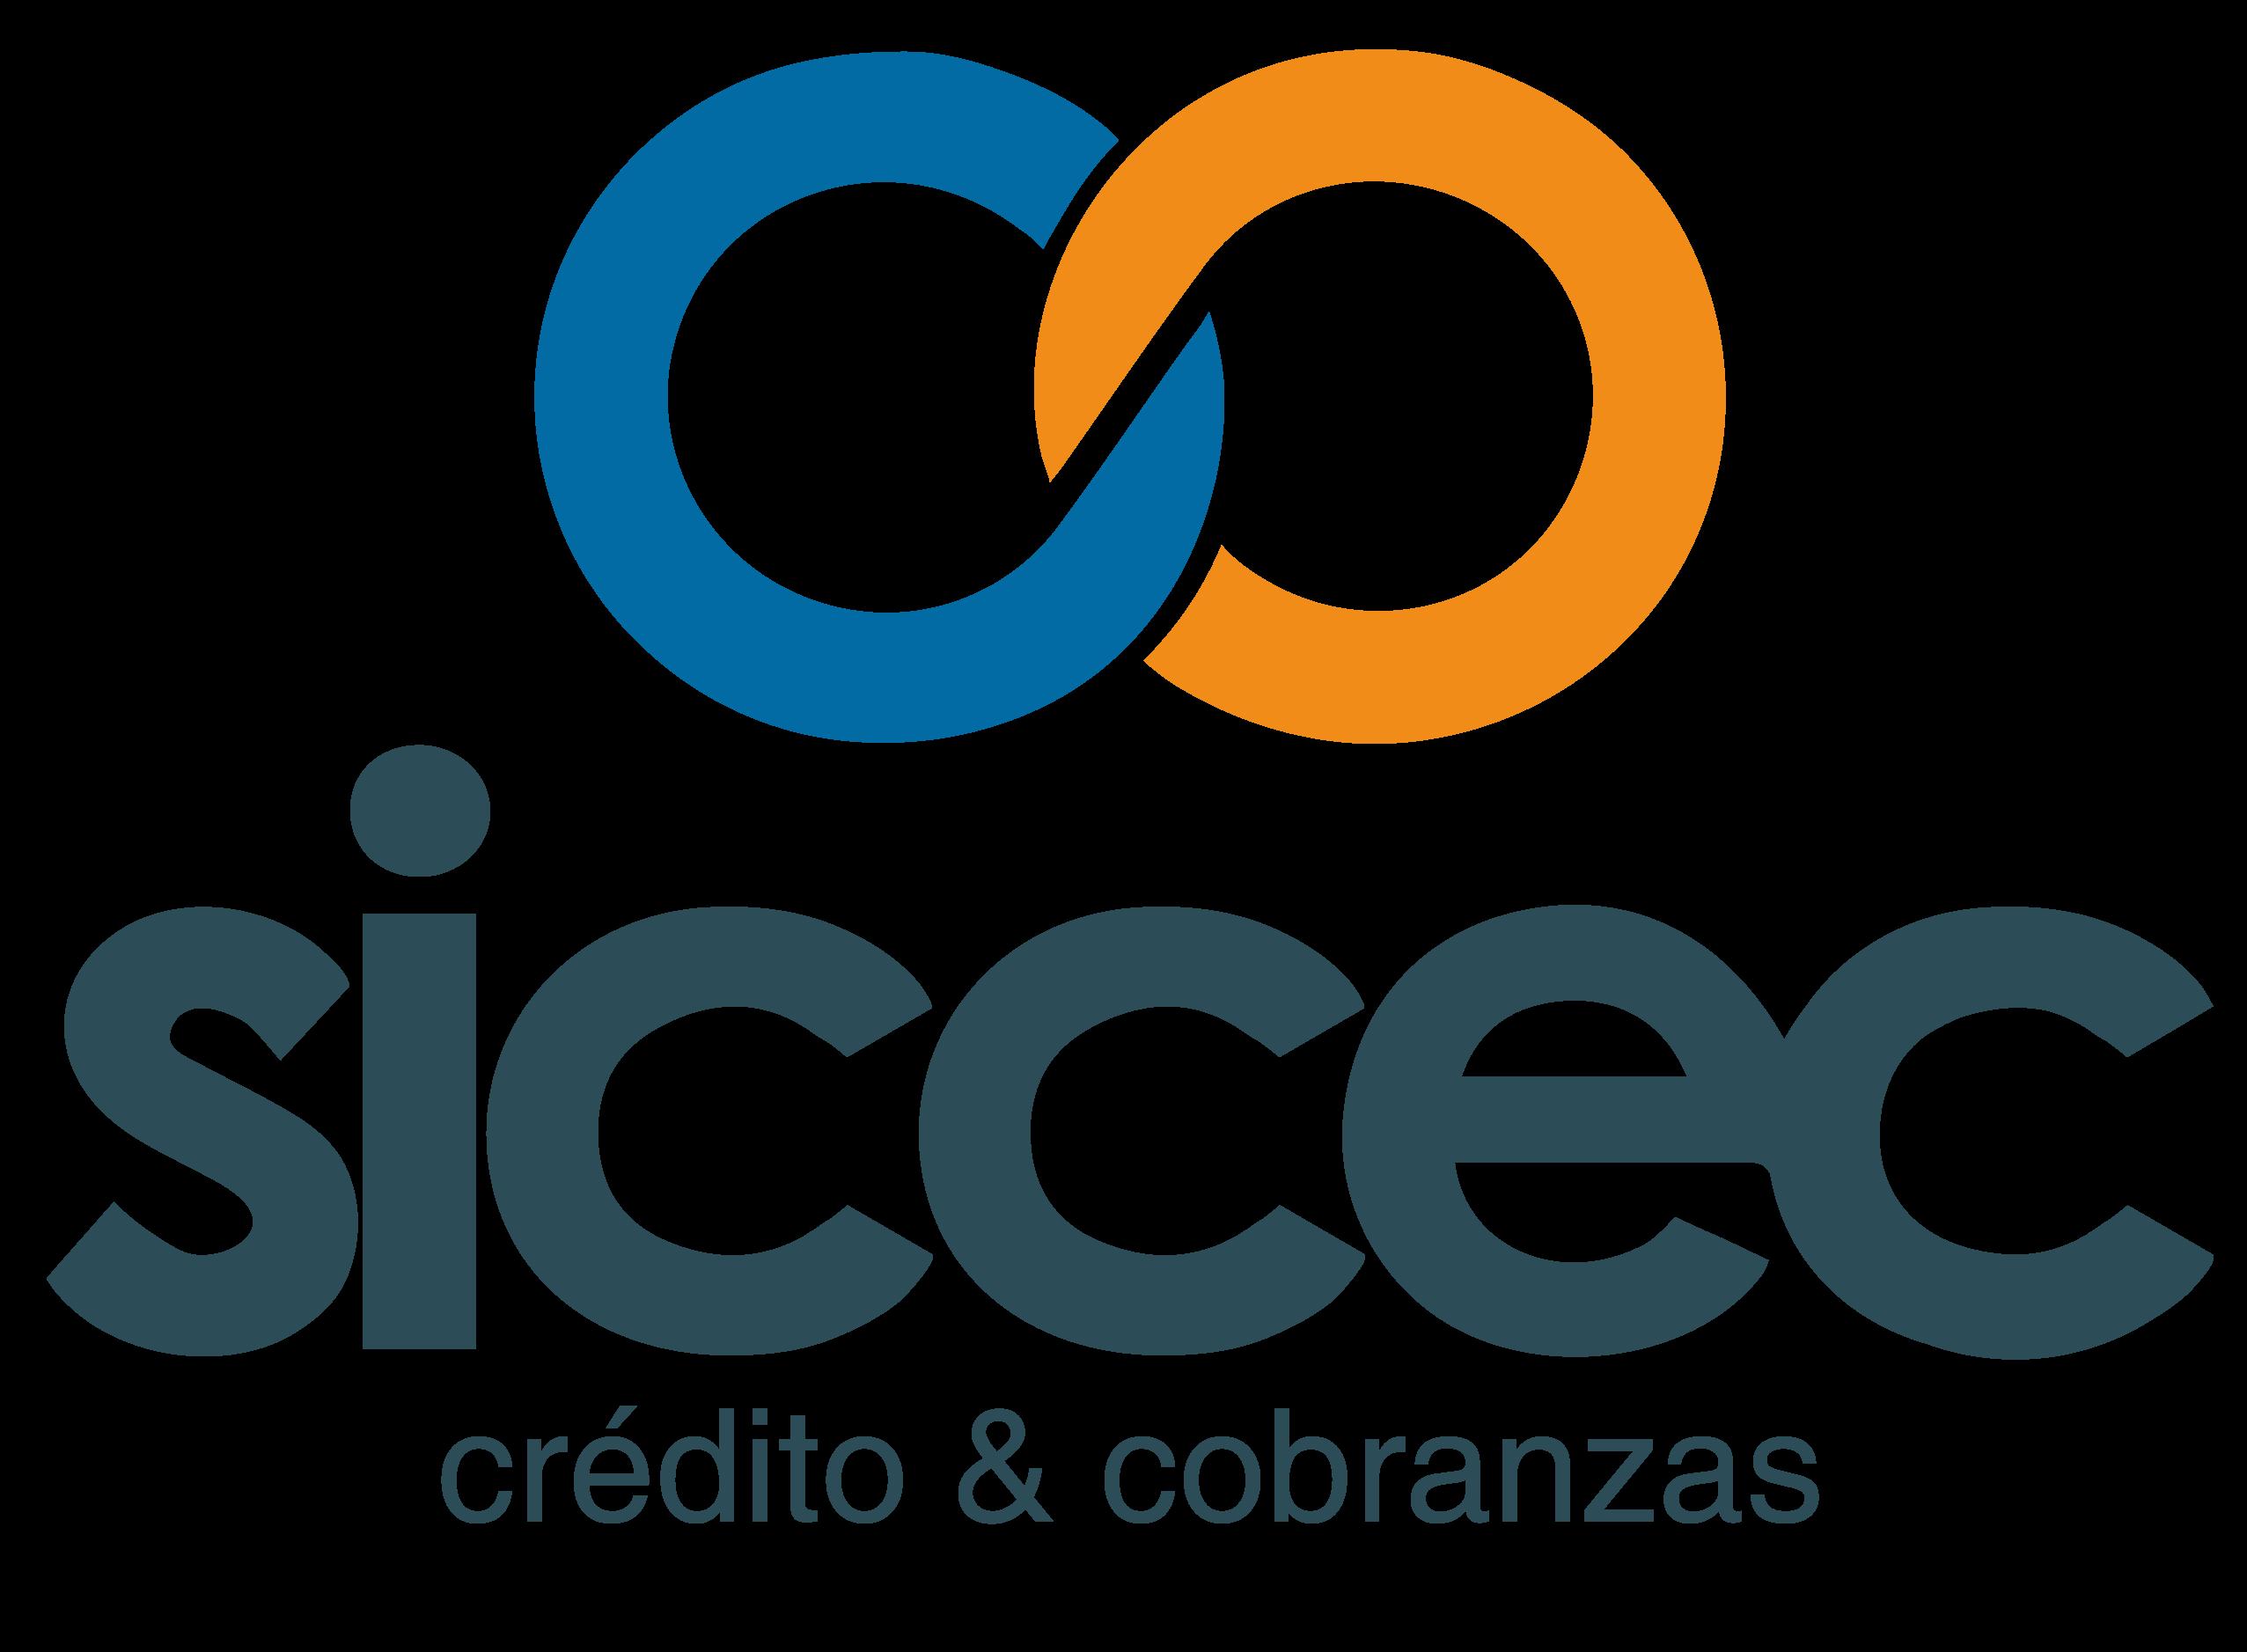 Siccec